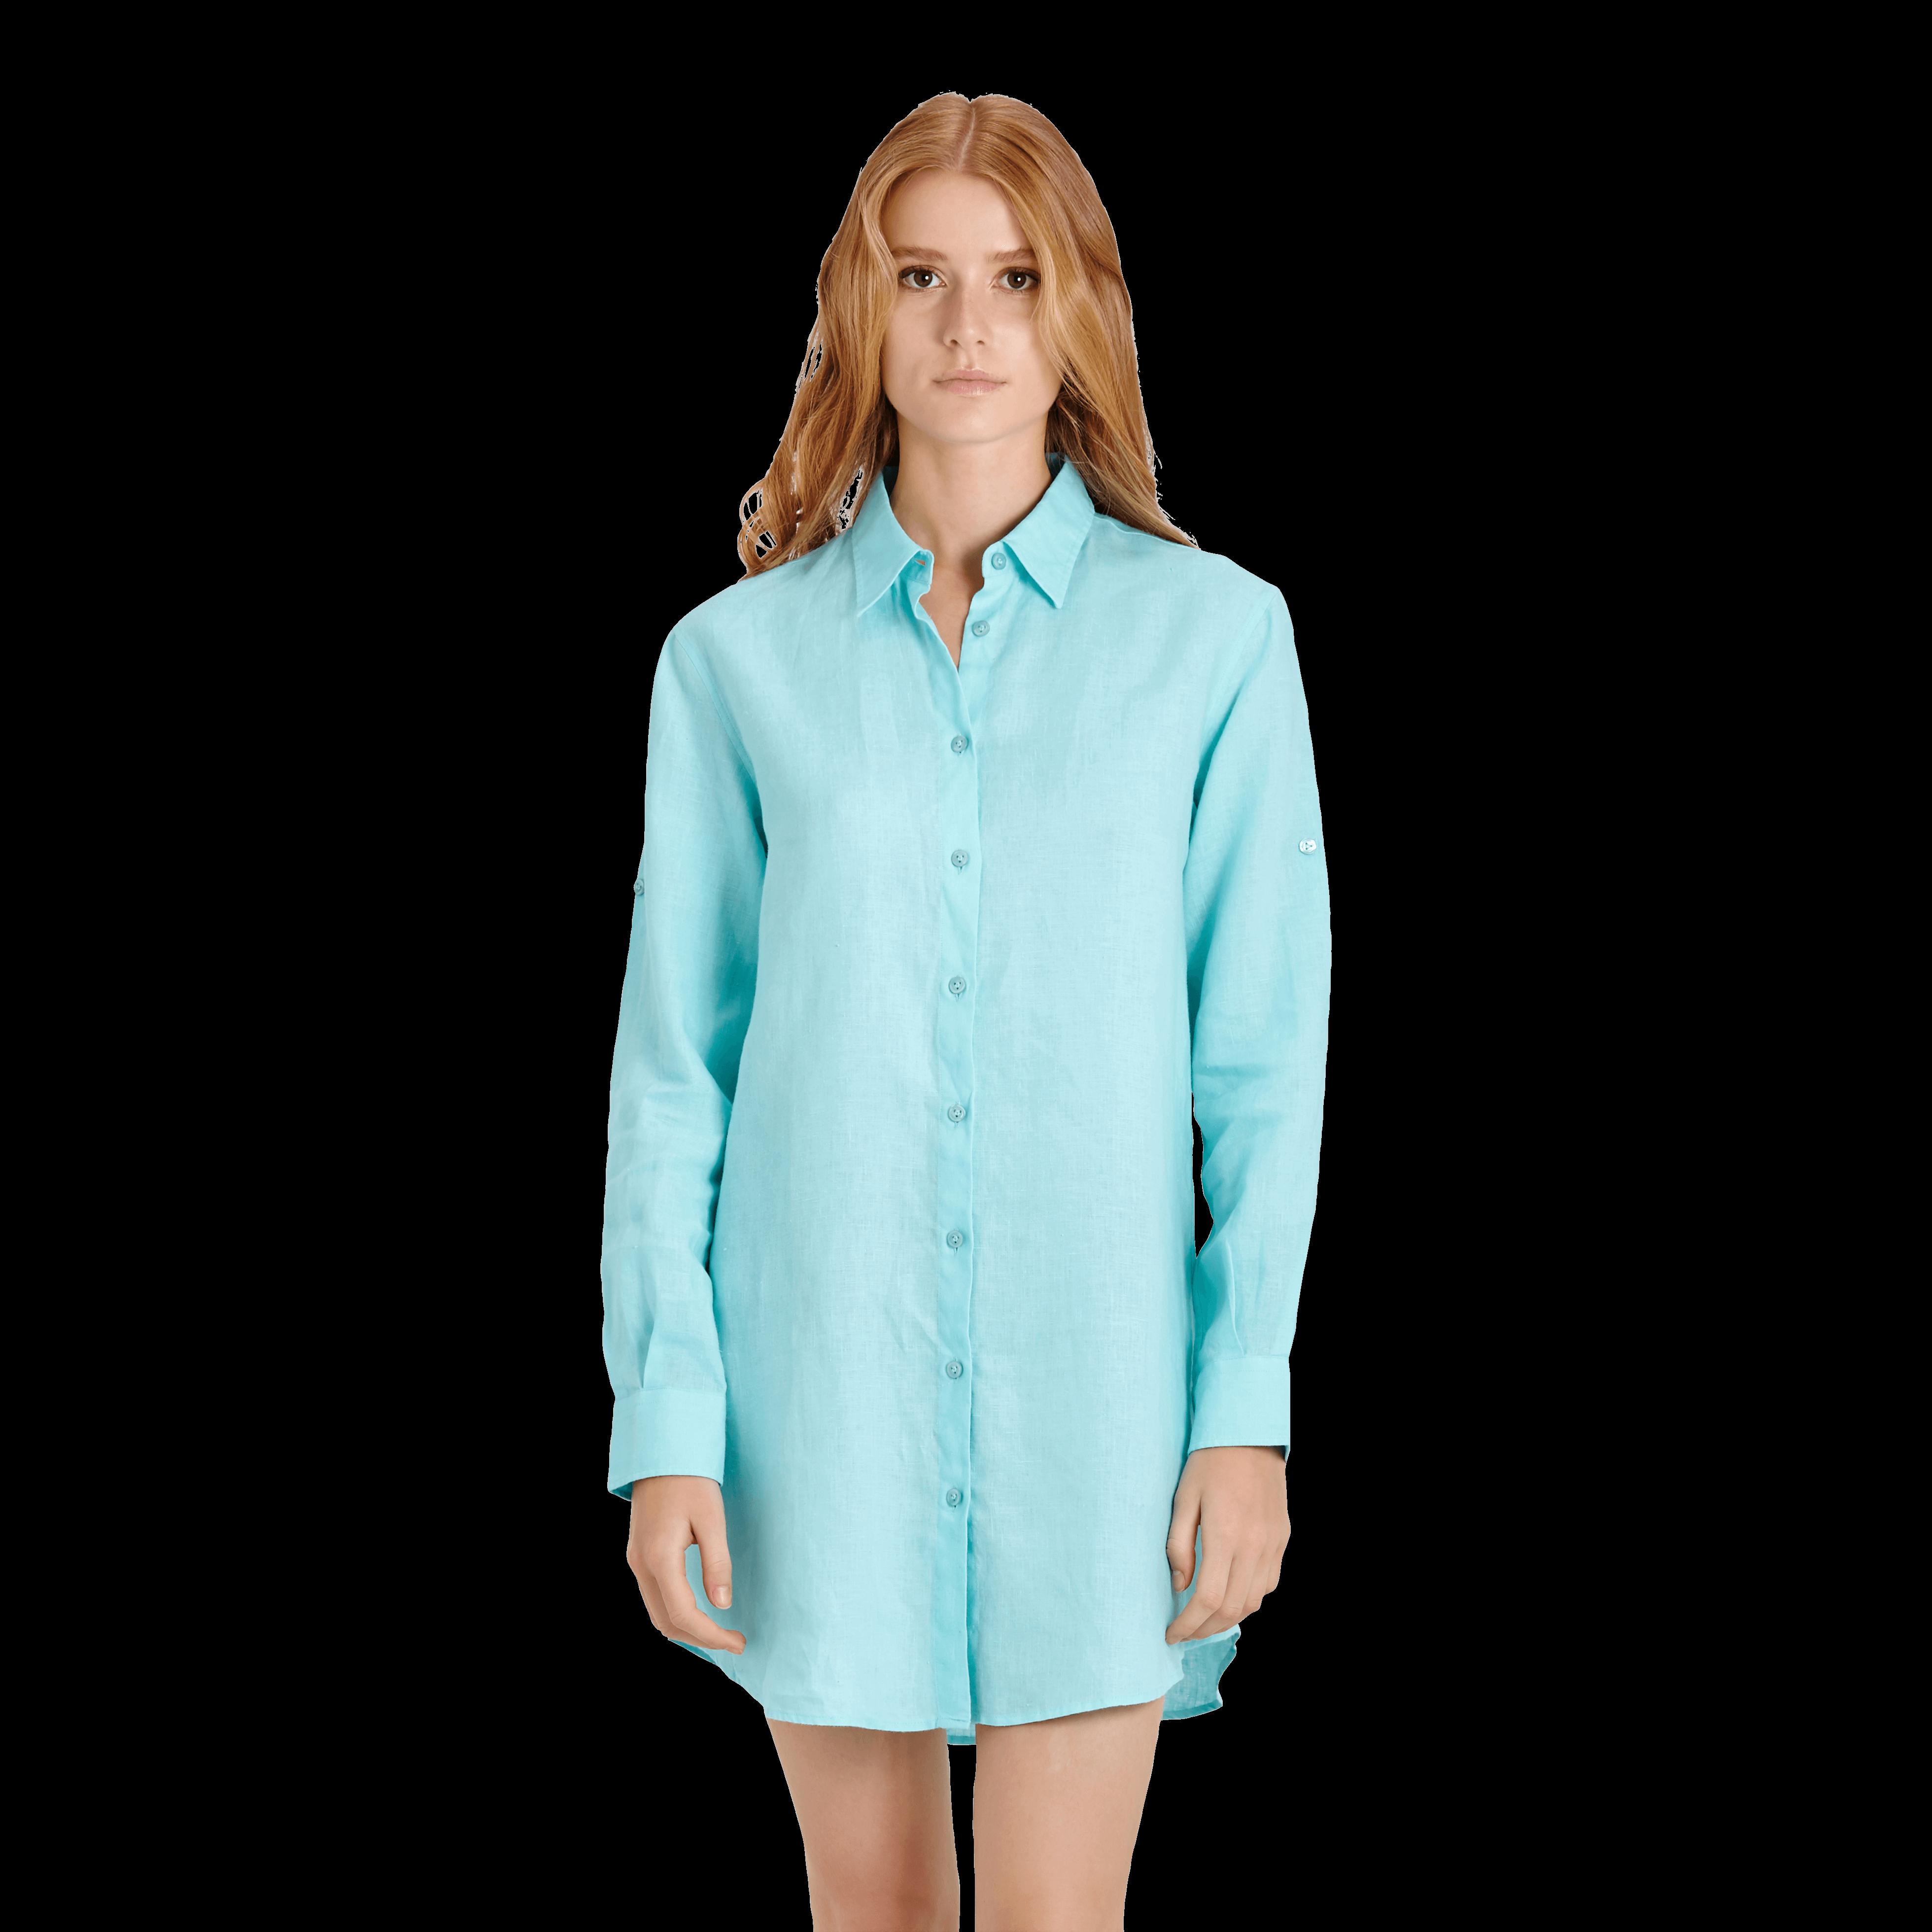 Vilebrequin Women Long Linen Shirt Solid In Blue